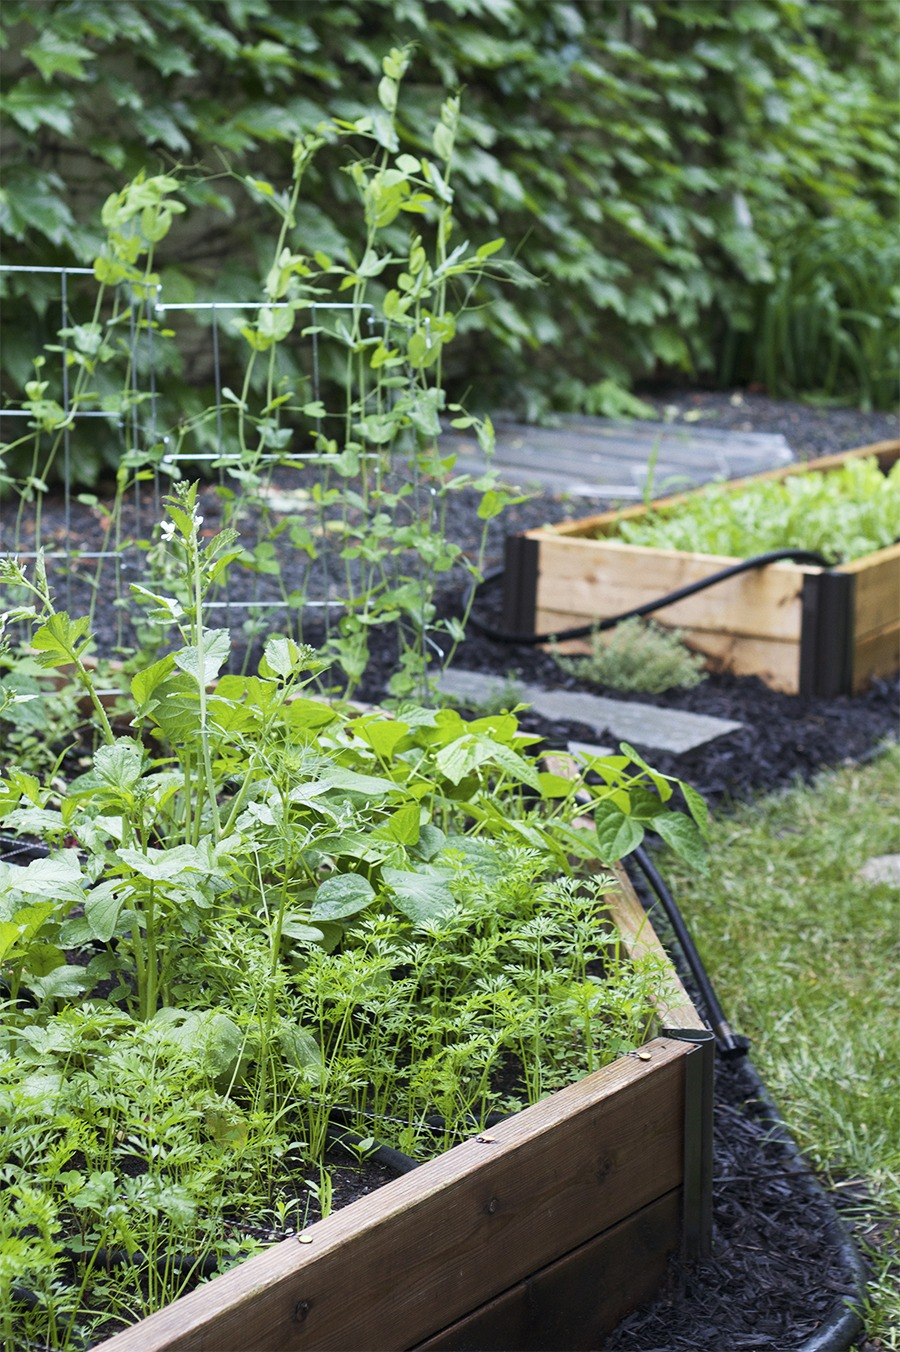 Gardening Basics : Installing a Garden Bed - Deuce Cities ... on Gardening  id=27035